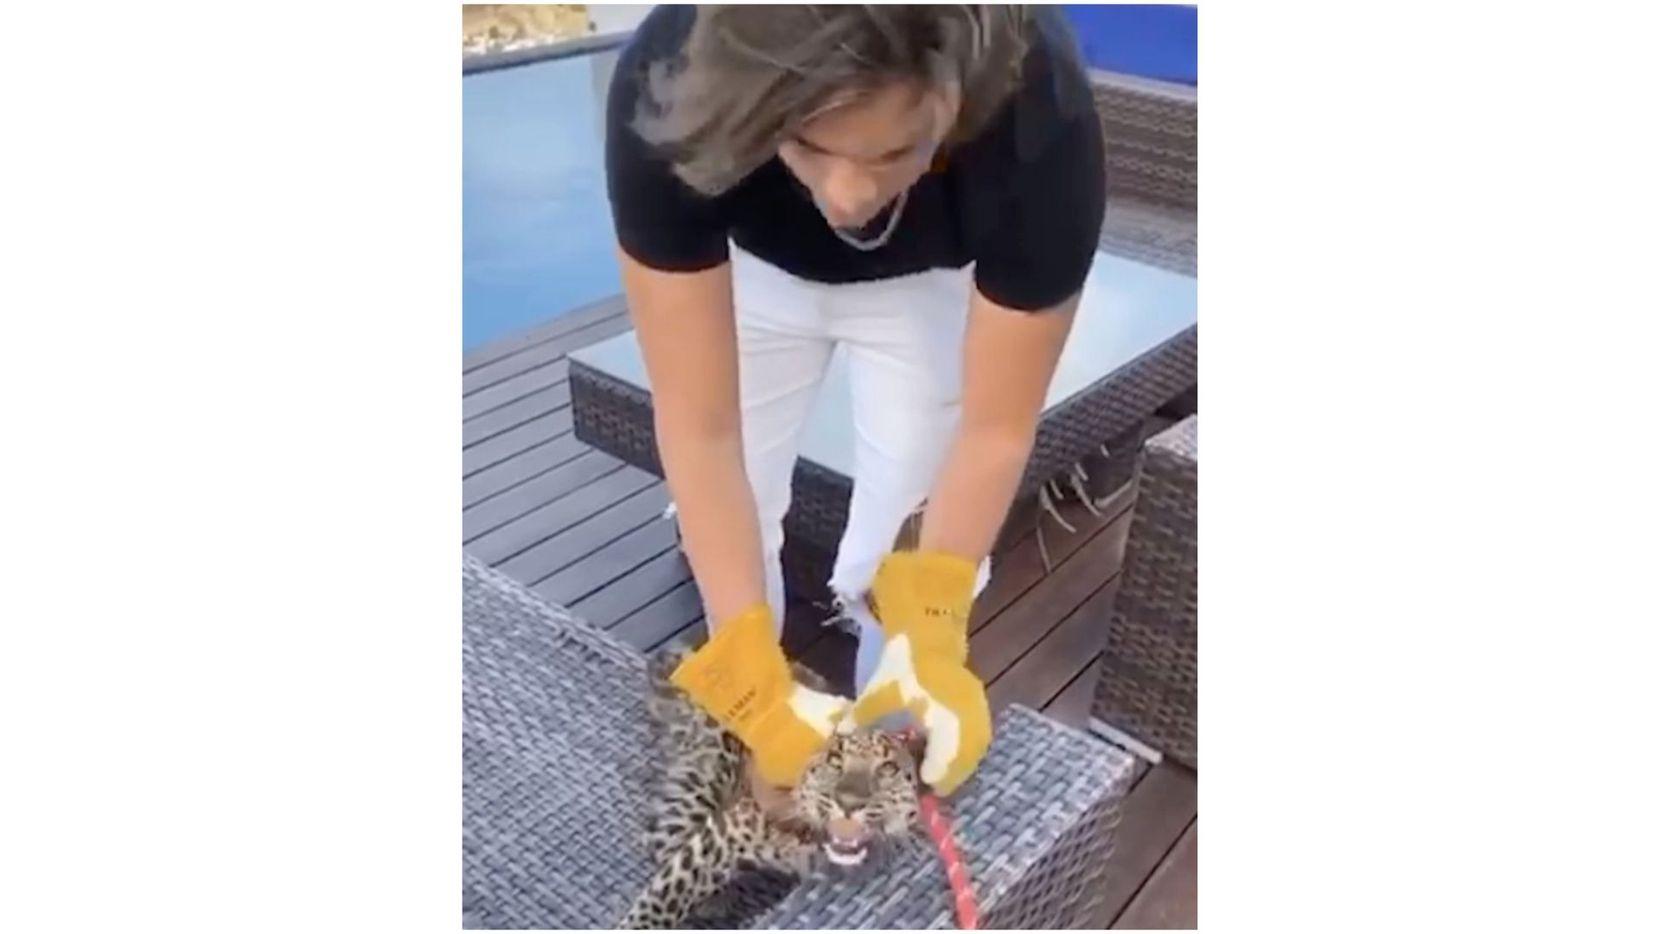 Maltrato animal provocó la salida de un concursante de un reality show en México.